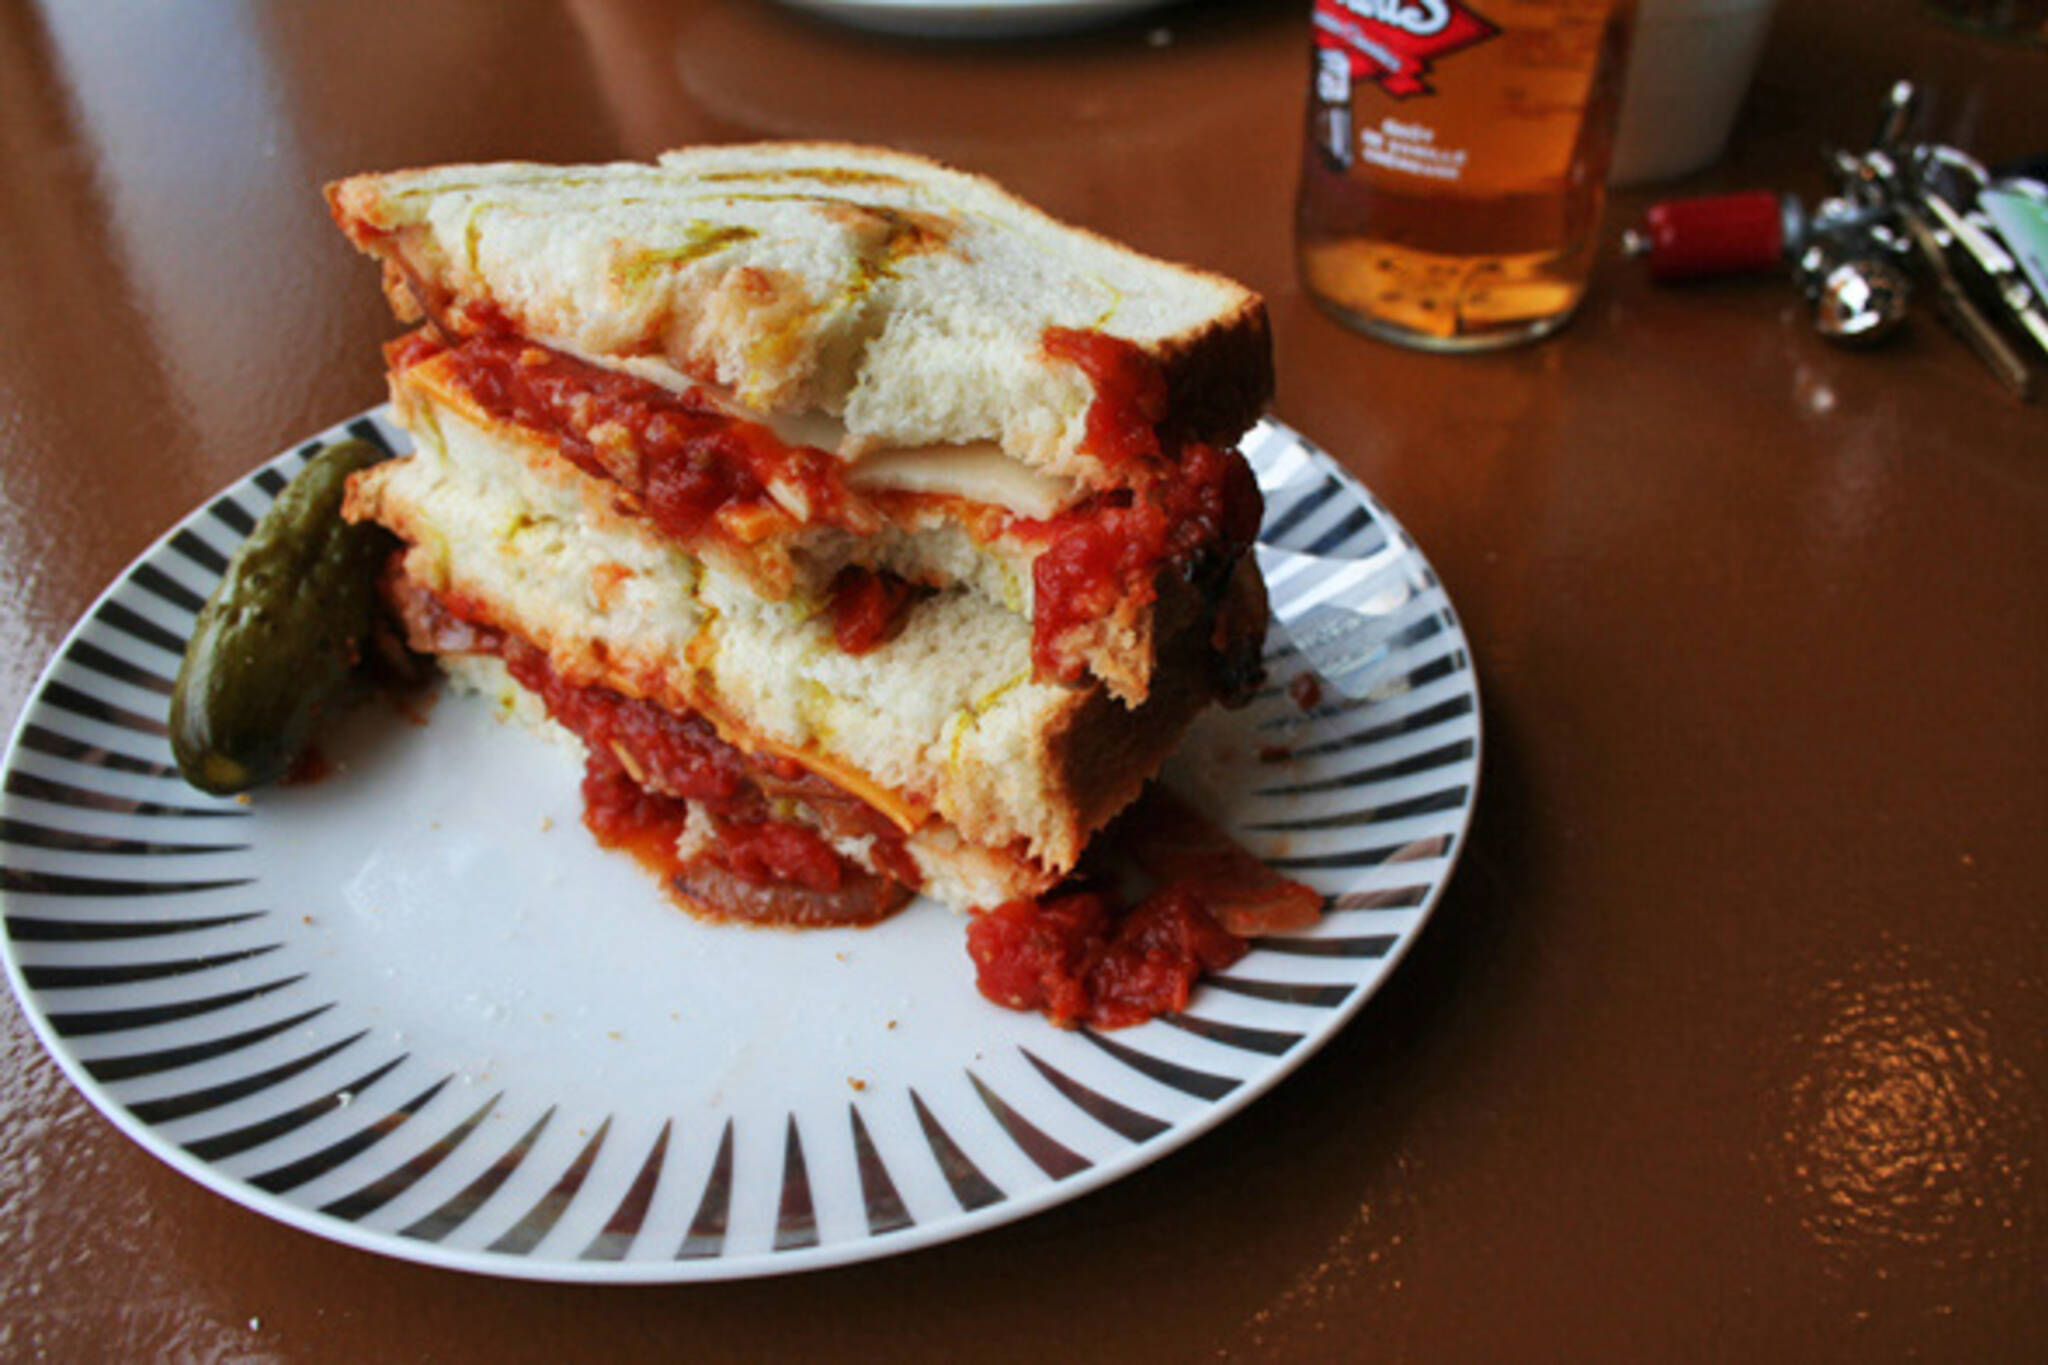 Wilco Sandwichs Toronto